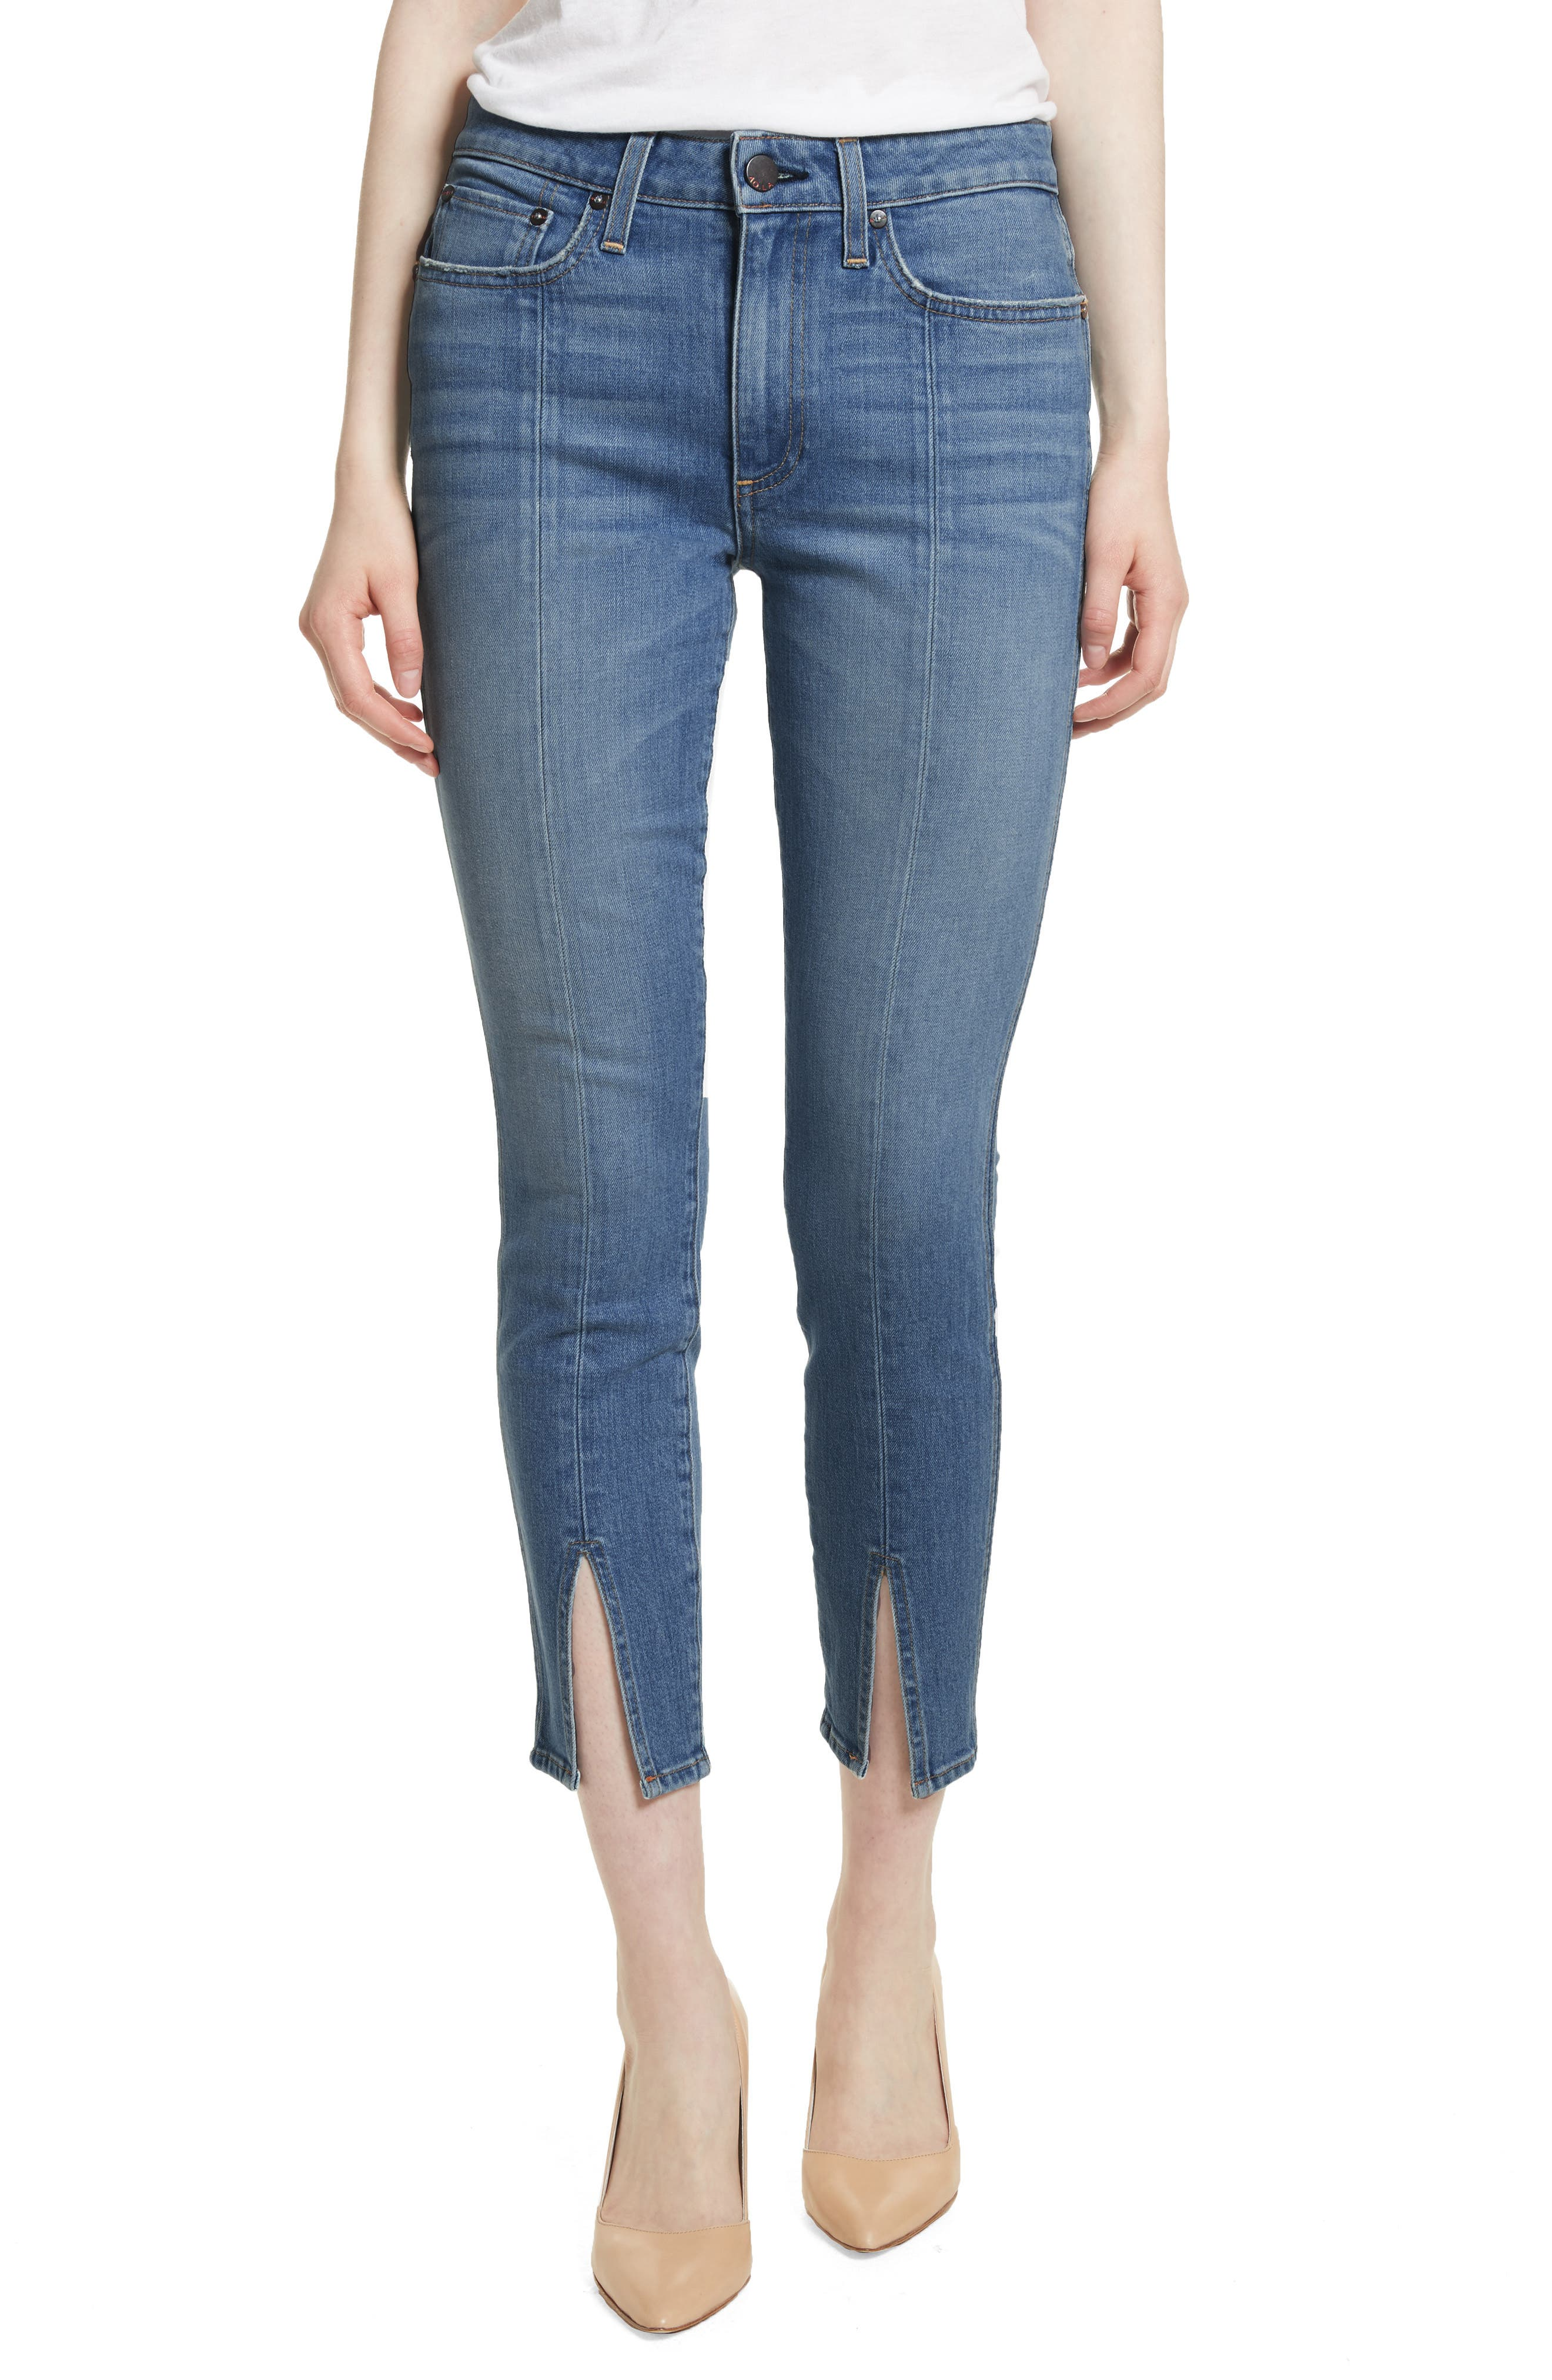 AO.LA Good Ankle Skinny Jeans,                             Main thumbnail 1, color,                             SWEET EMOTION